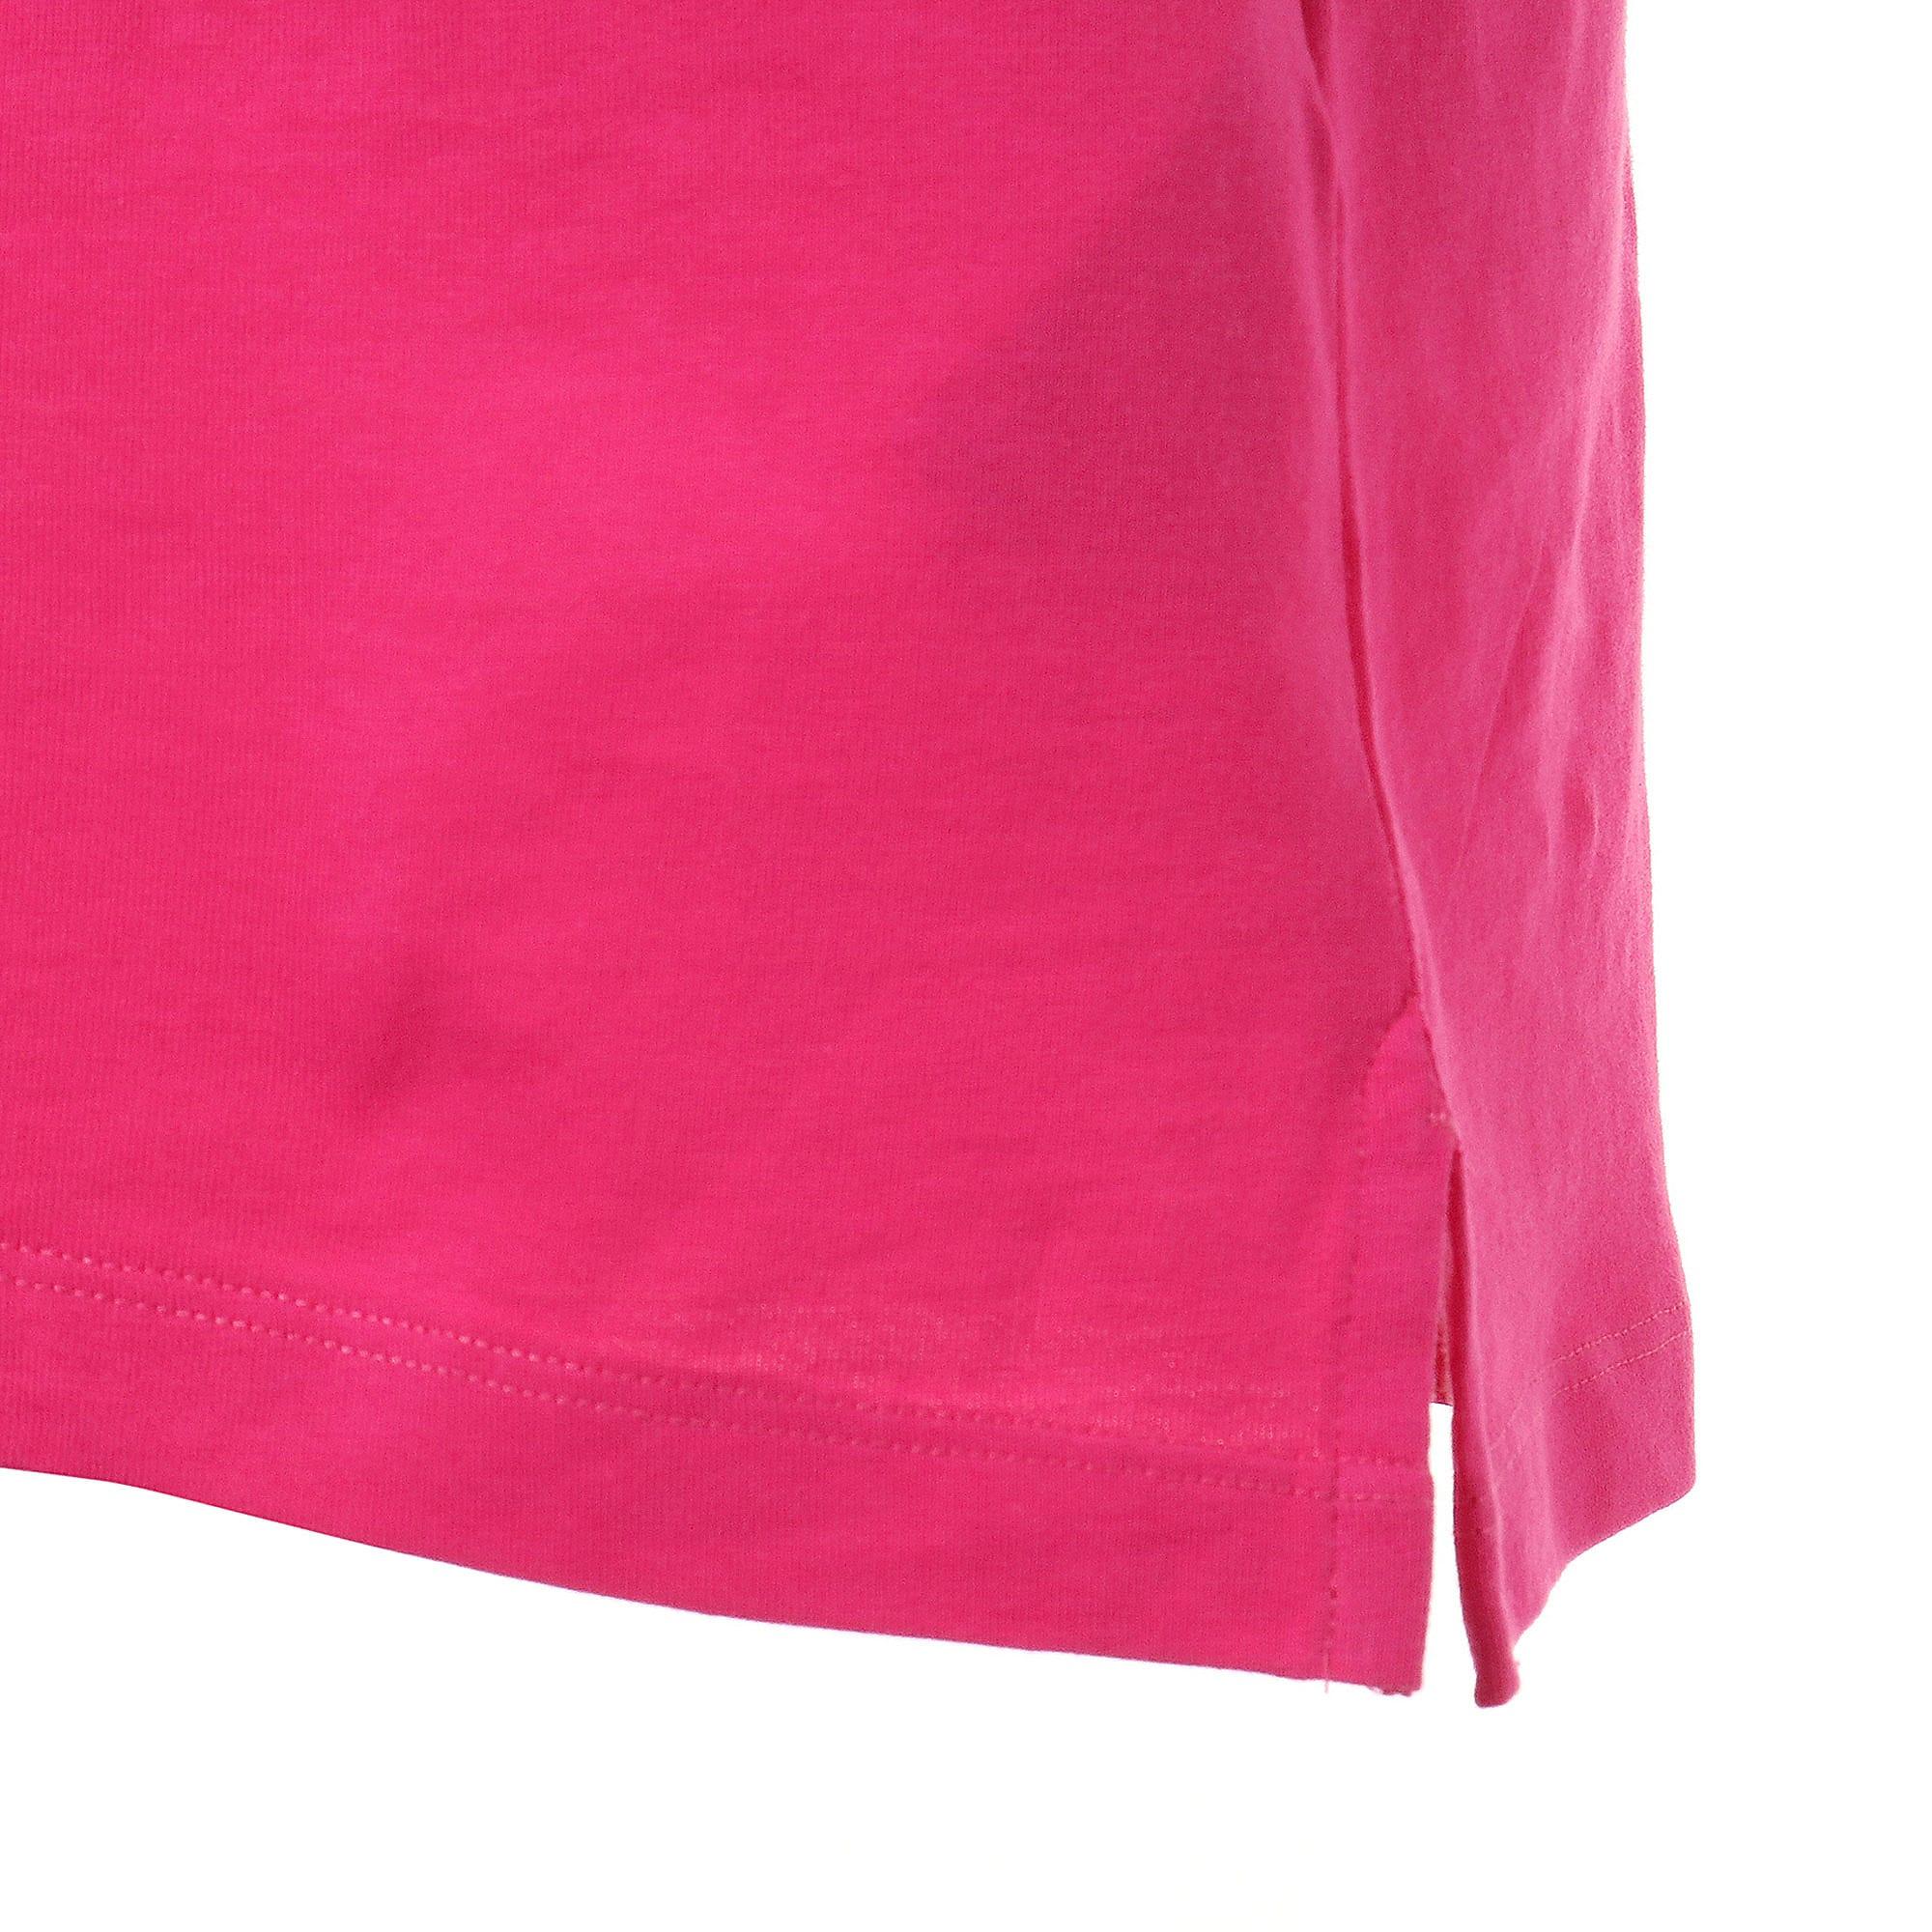 Thumbnail 6 of CHASE ウィメンズ タンクドレス, Fuchsia Purple, medium-JPN